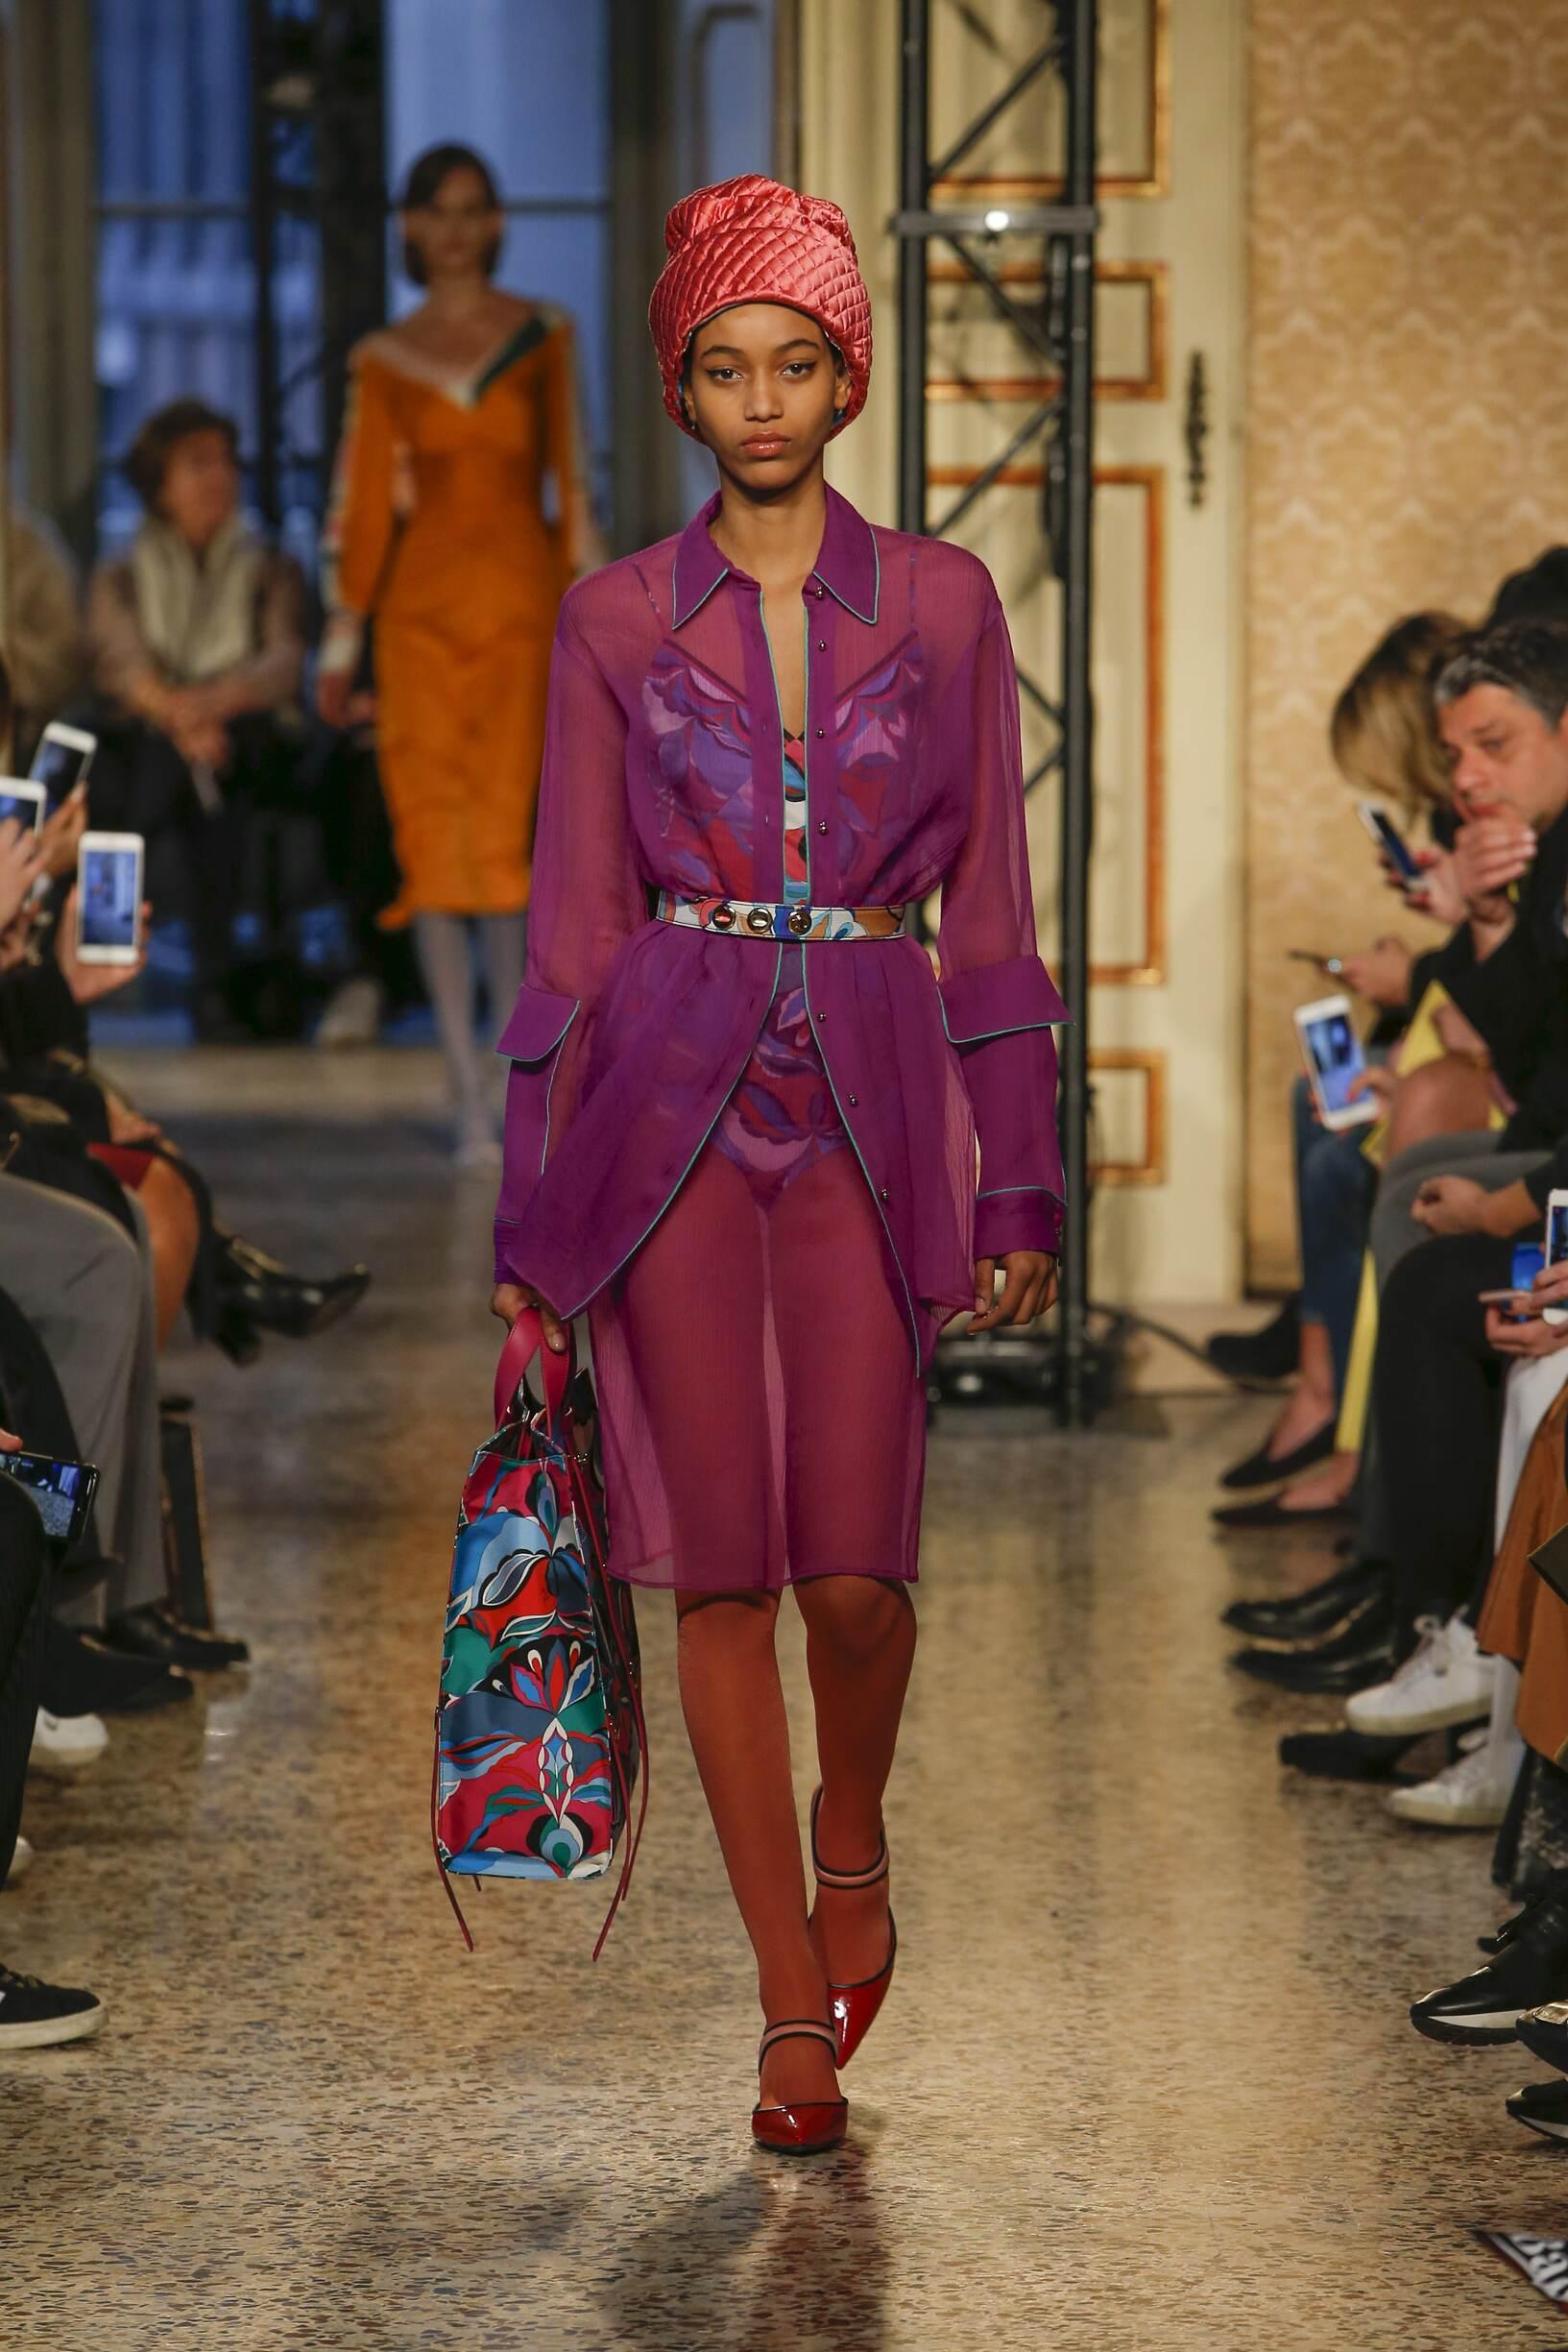 Woman Fall 2018 Fashion Trends Emilio Pucci